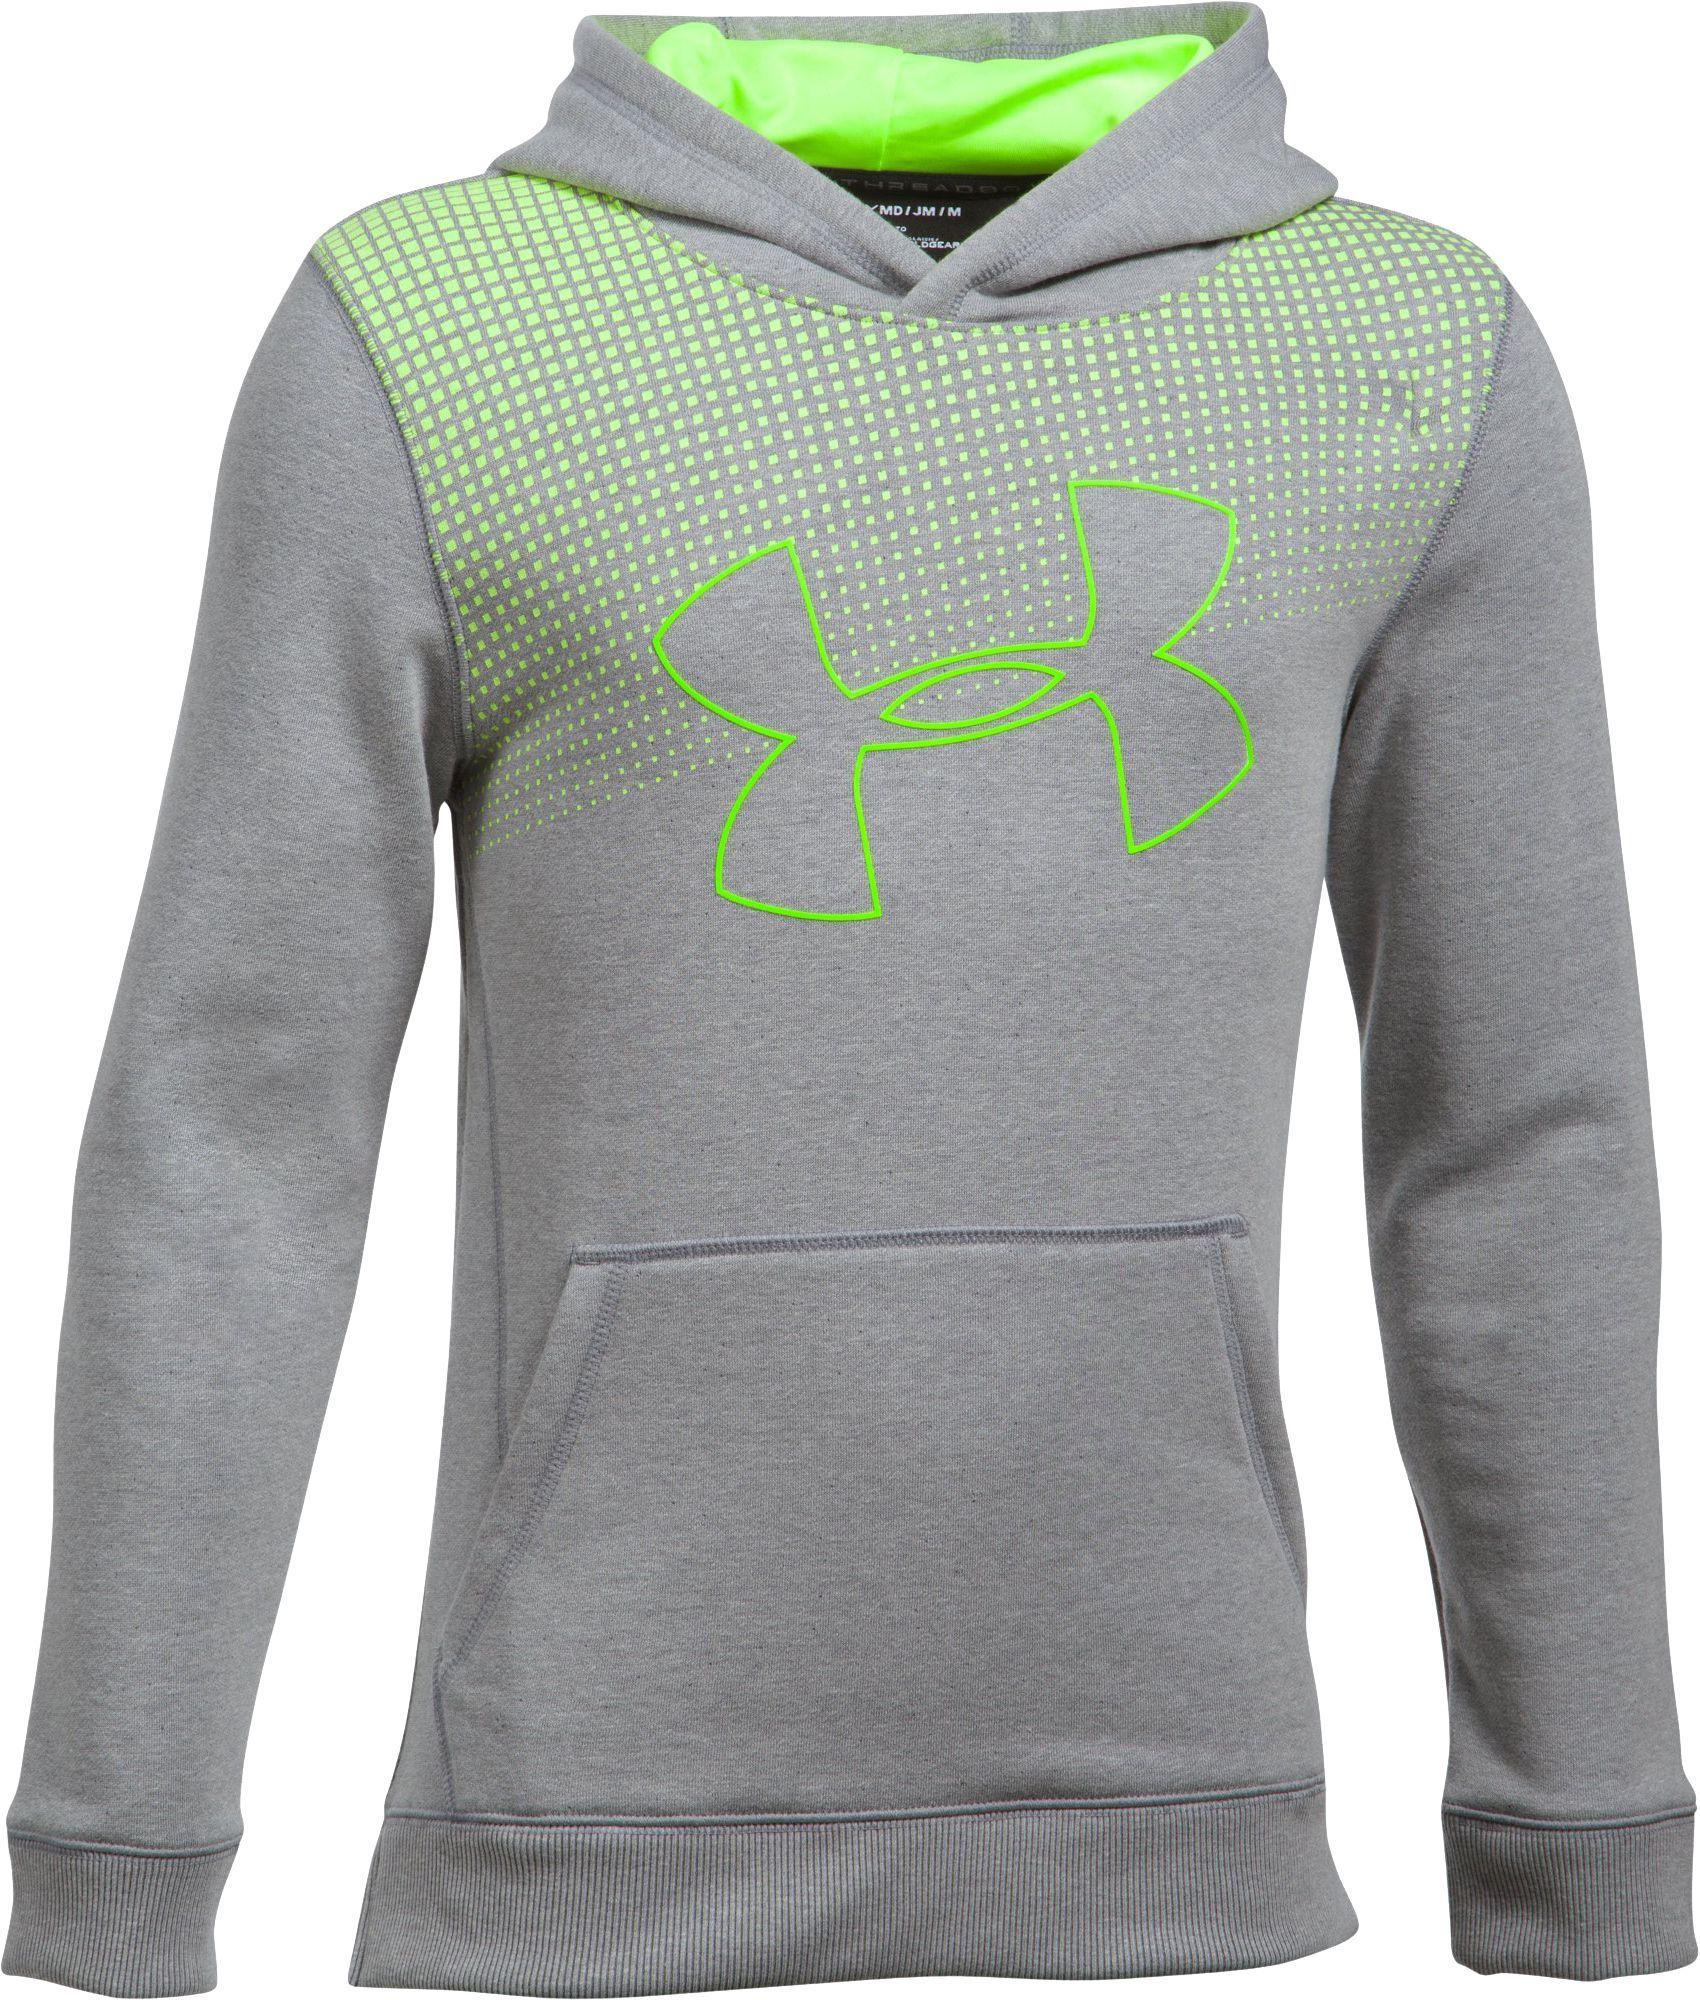 English Laundry Boys Fashion Jersey Fleece Hooded Jacket O/_E285H